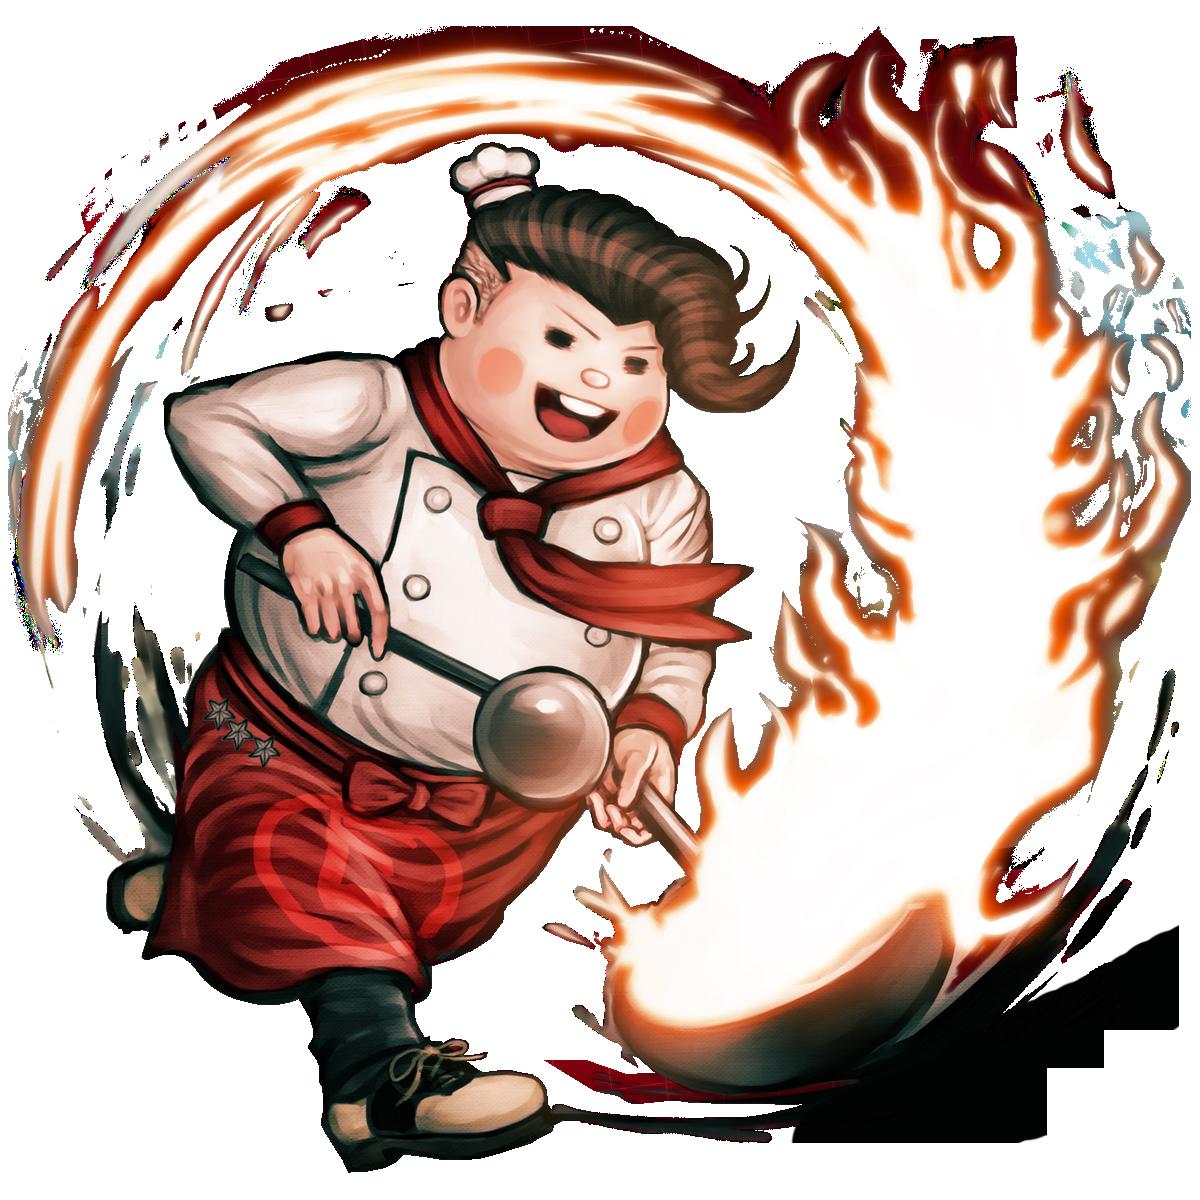 Fat boy playing basketball clipart svg black and white stock Teruteru Hanamura | Danganronpa Wiki | FANDOM powered by Wikia svg black and white stock